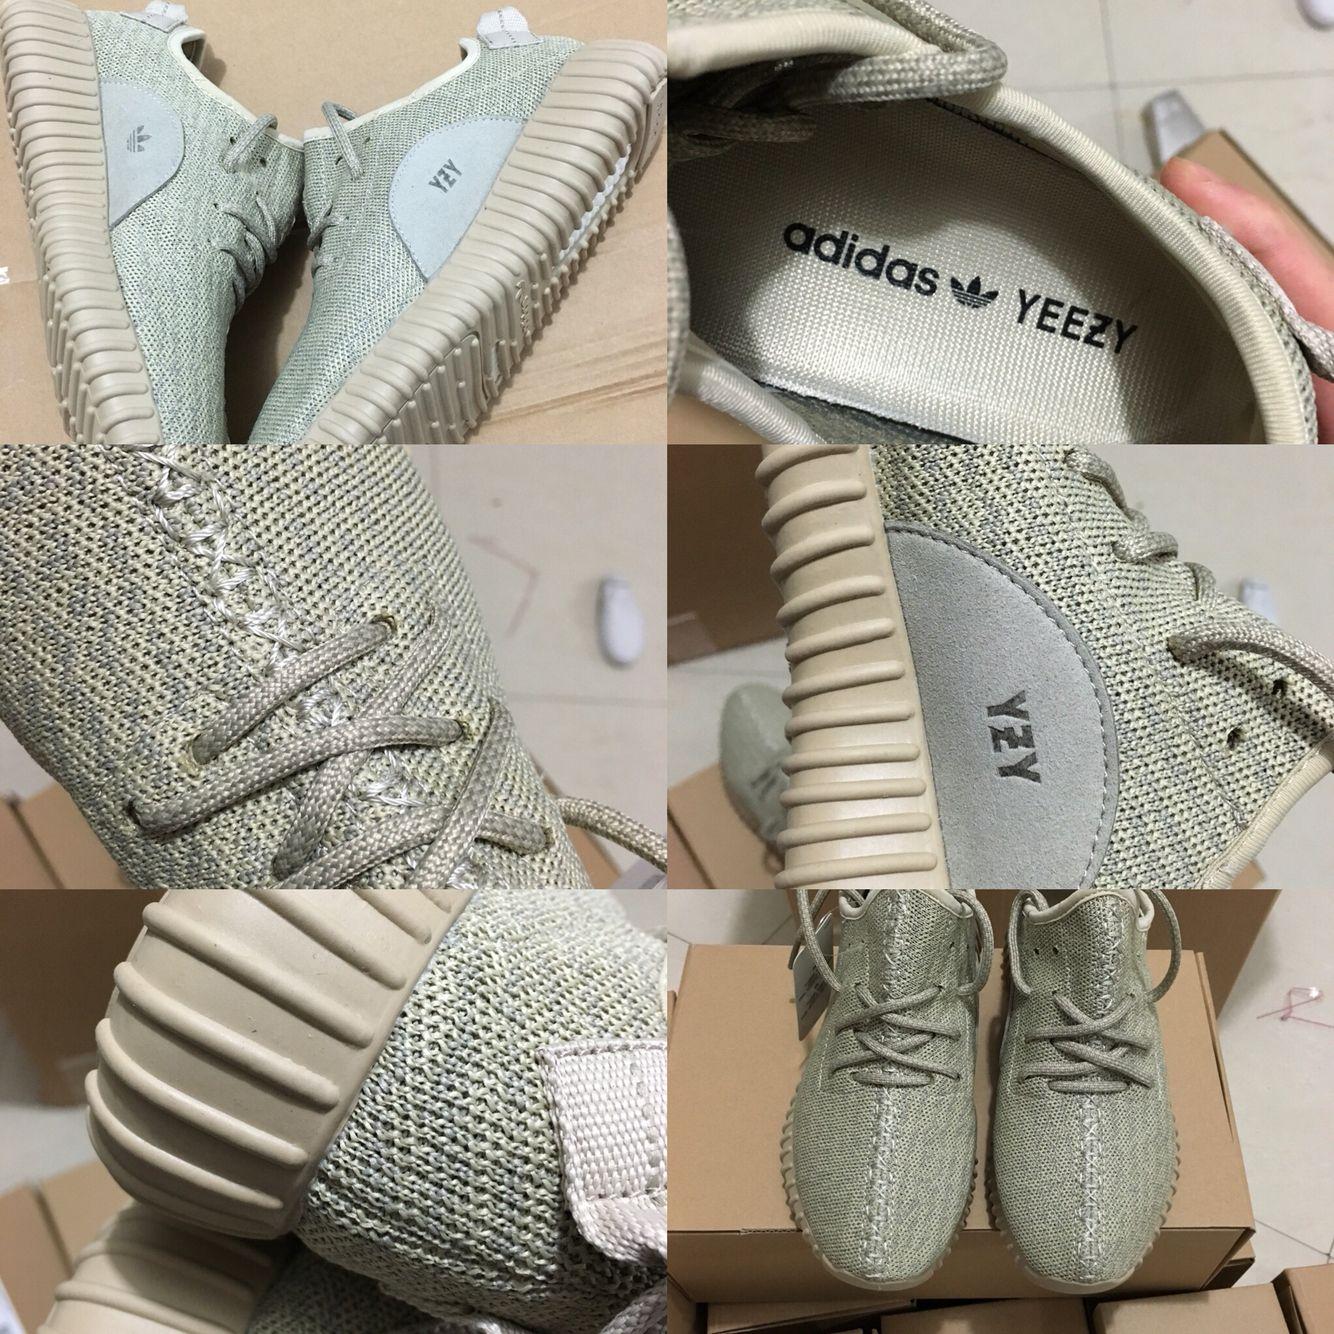 Adidas yeezy boost, Adidas, Yeezy